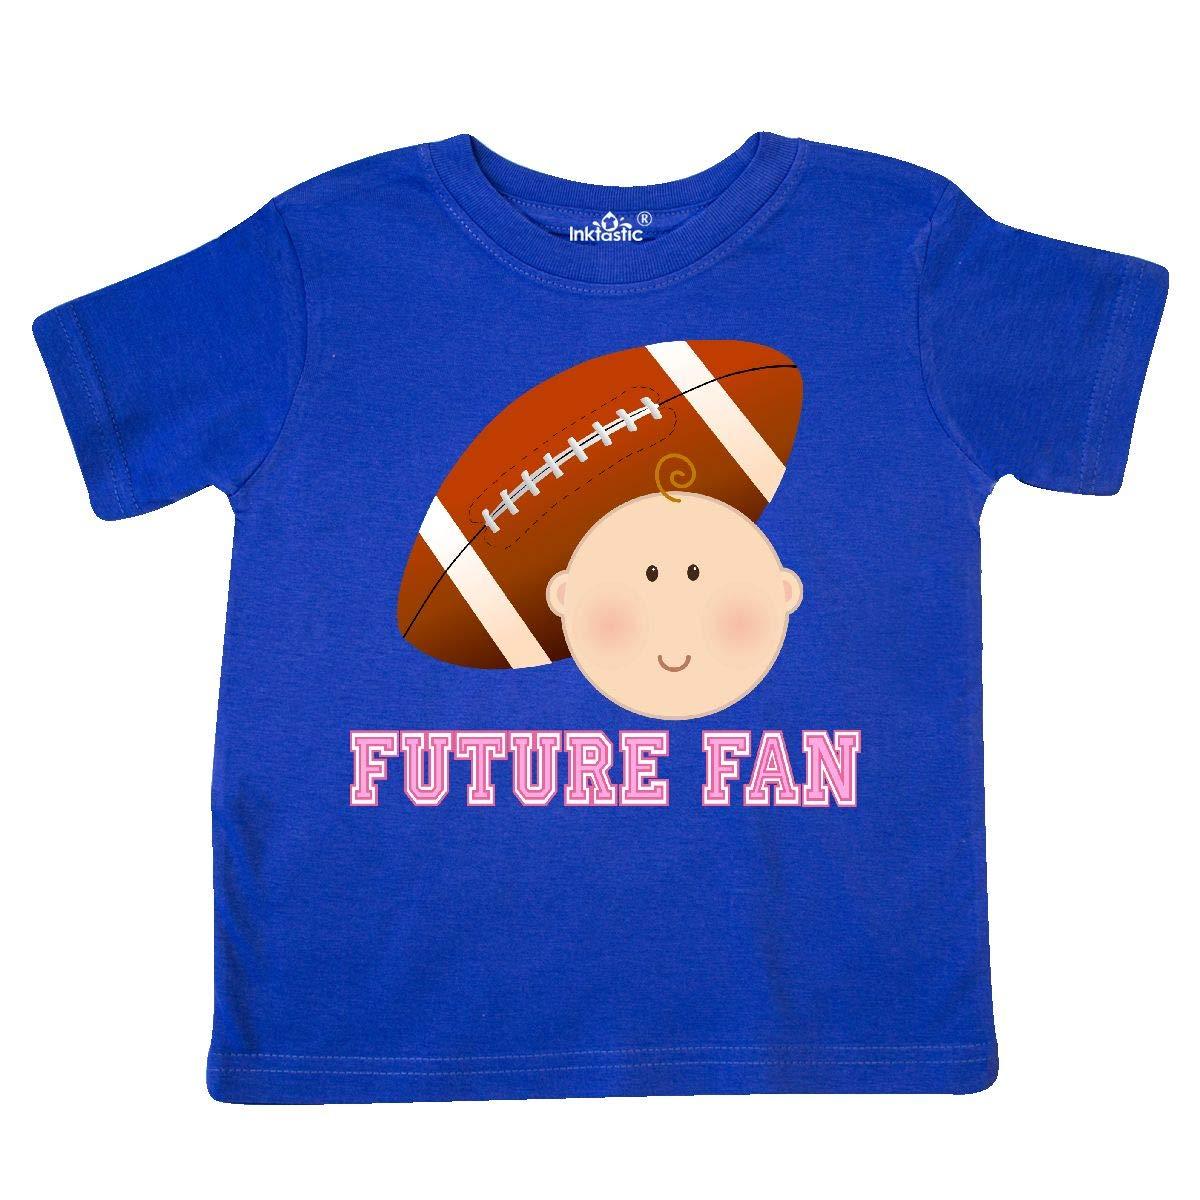 inktastic Girls Football Future Fan Toddler T-Shirt